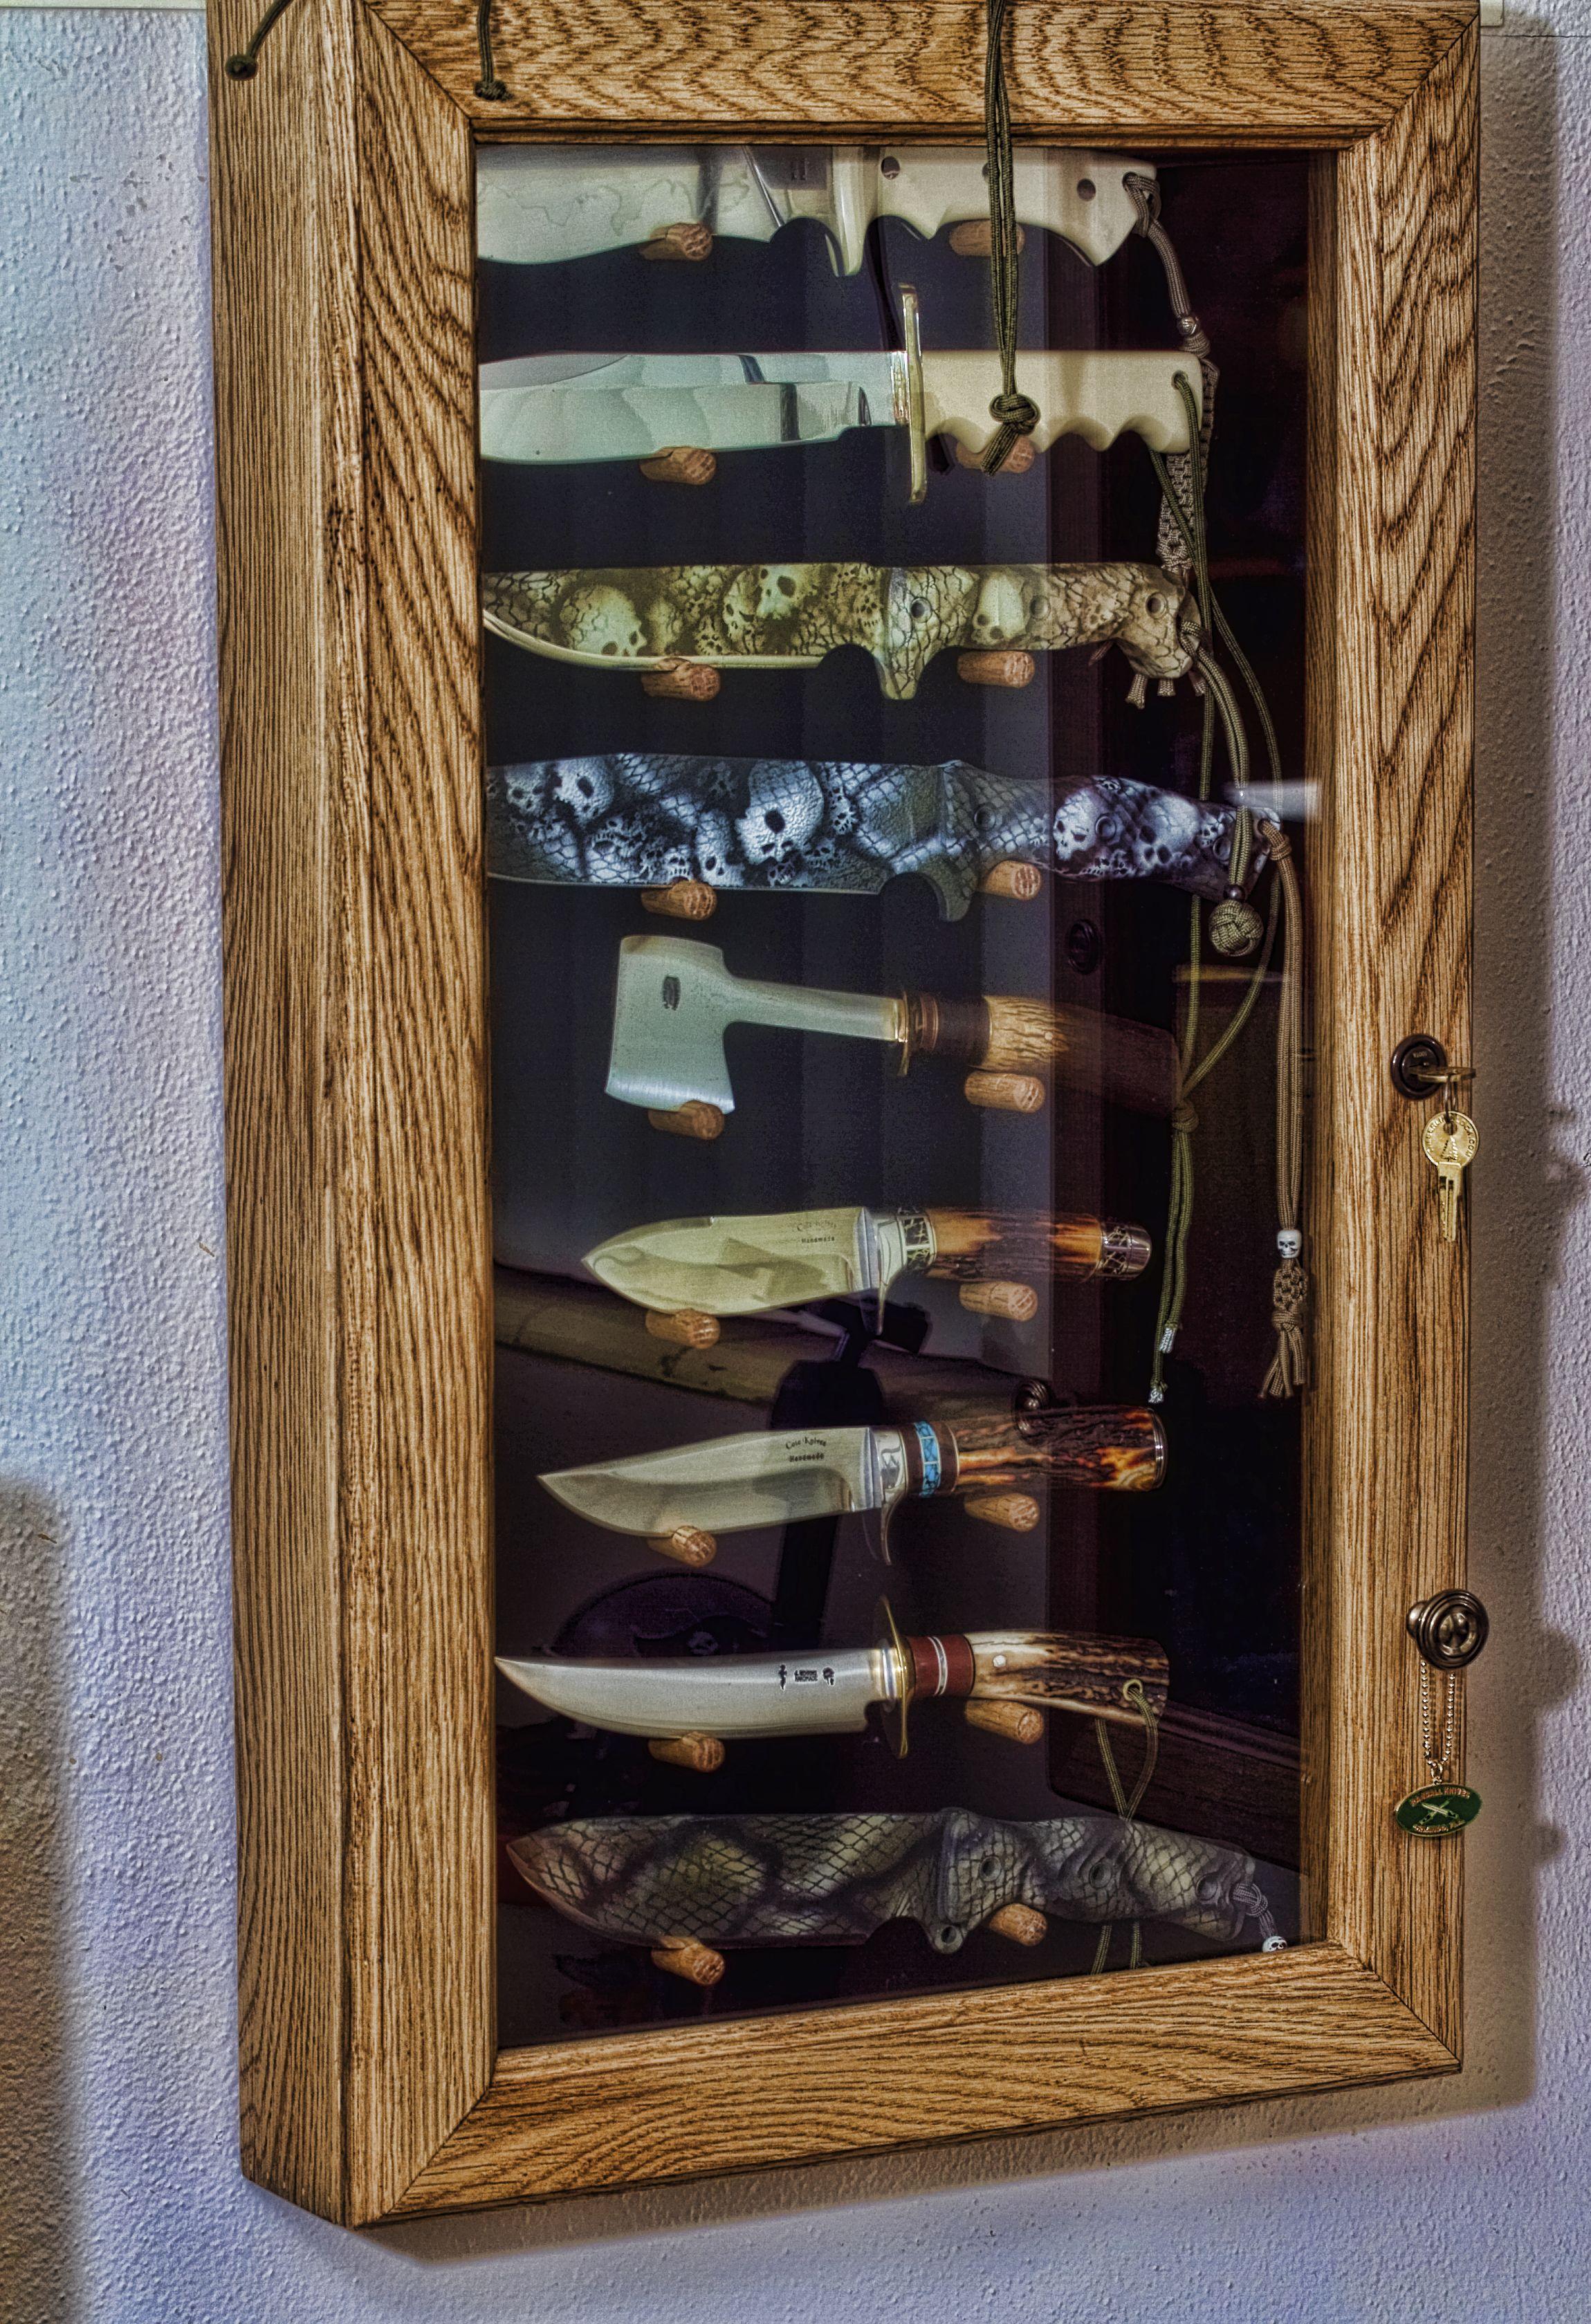 Man Cave Cabinet Ideas : Man cave knife cabinet dream home pinterest